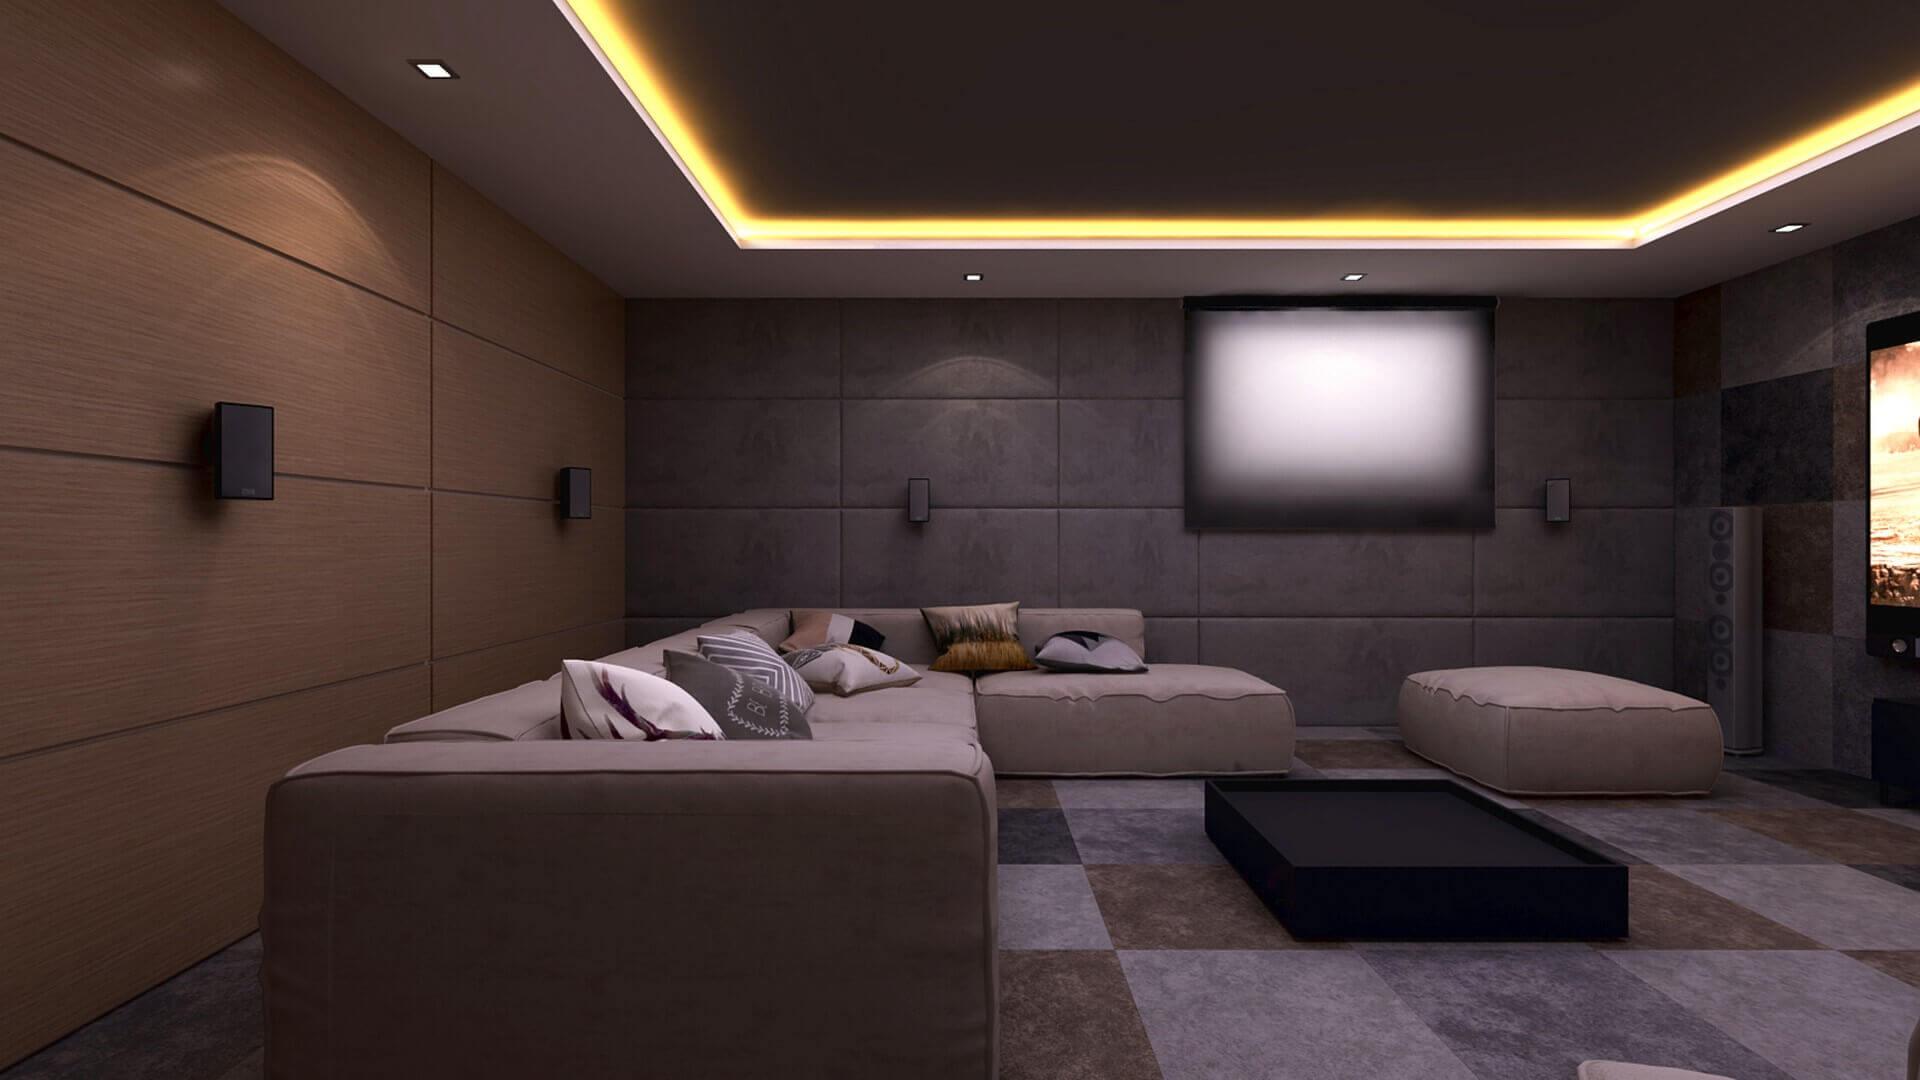 House interior architecture 3011 E. Uslu Konutu Residential